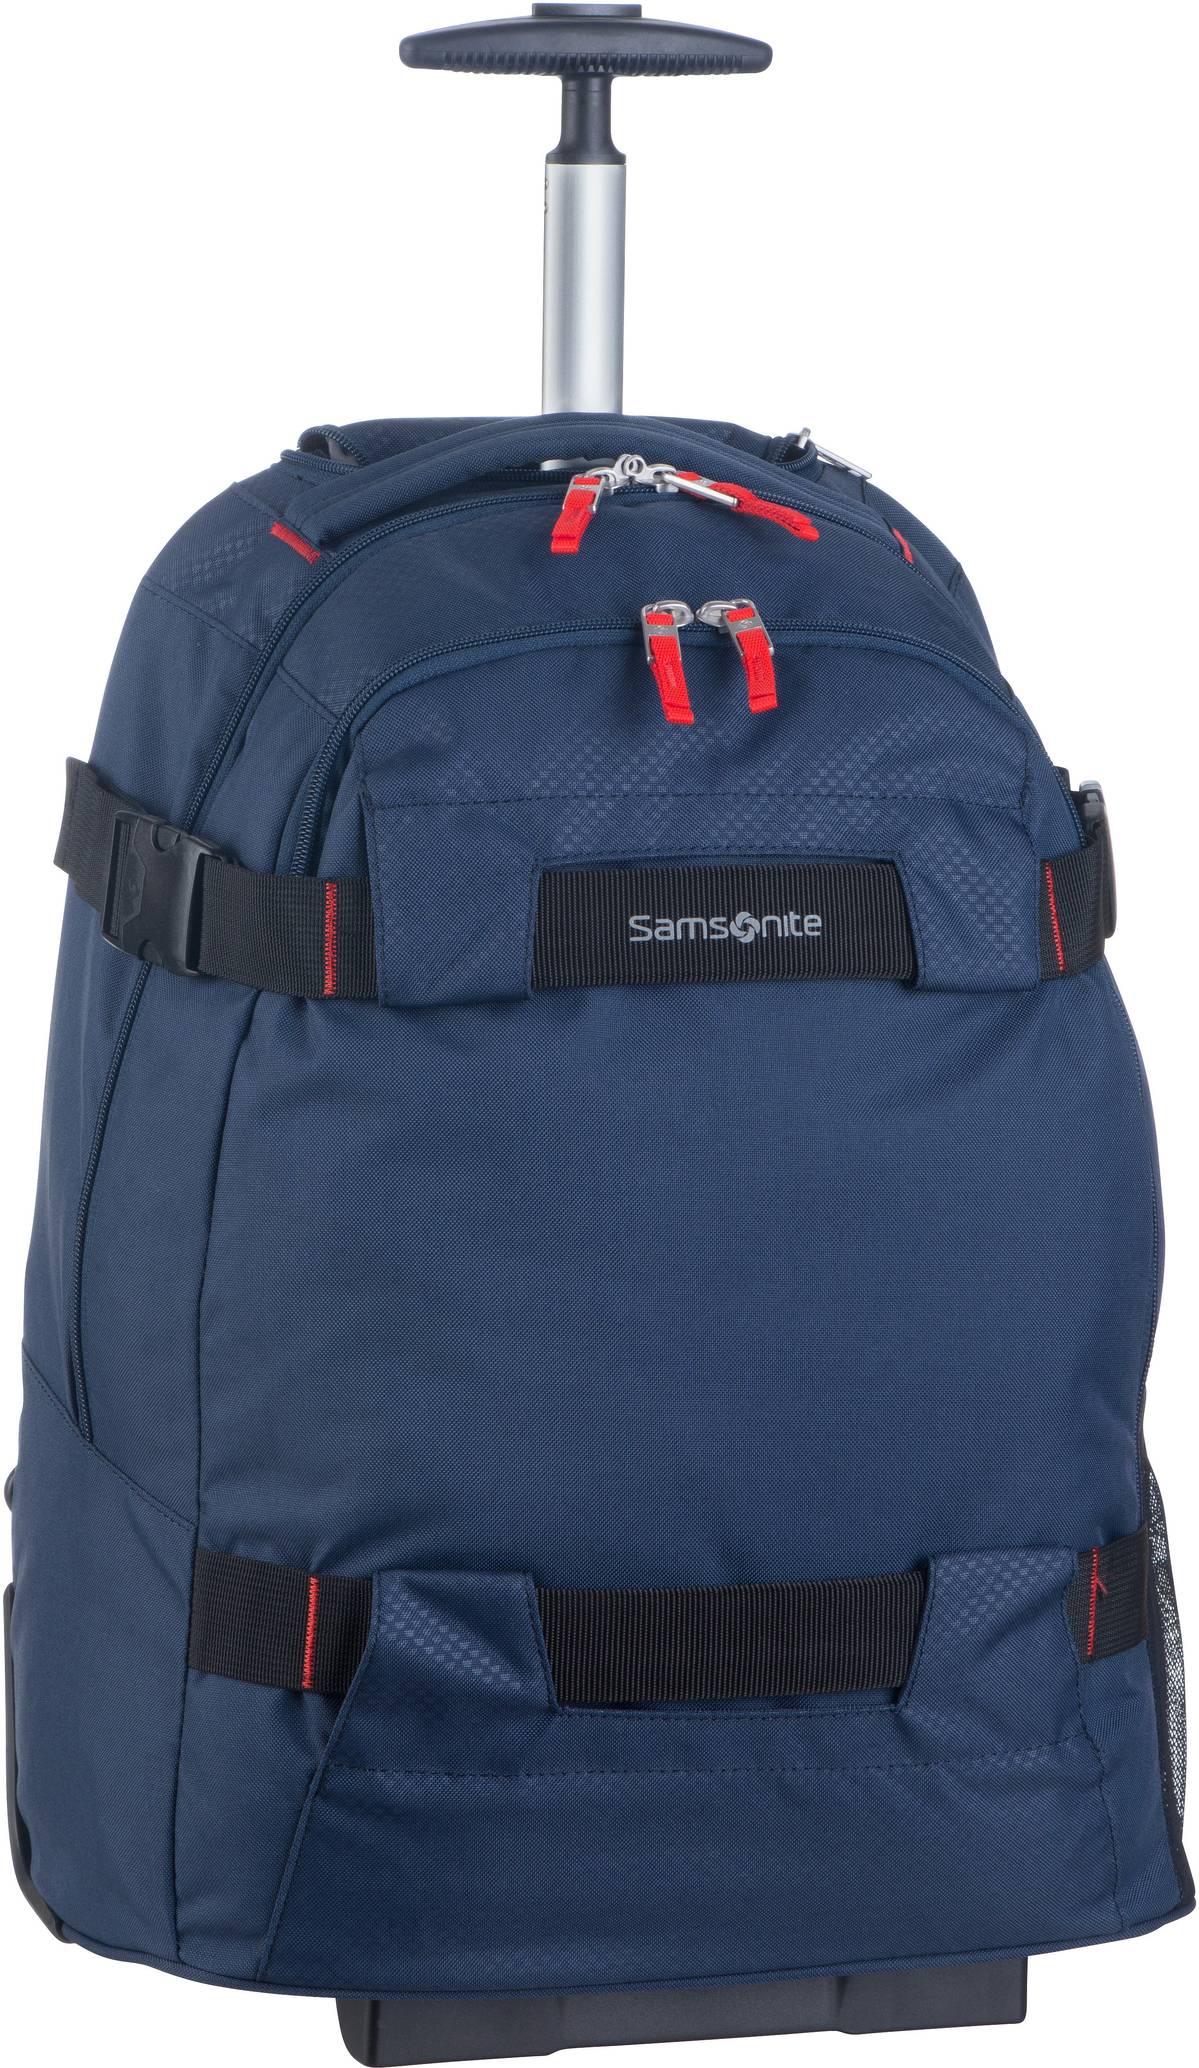 Rucksack-Trolley Sonora Laptop Backpack/Wh 55 Night Blue (30 Liter)